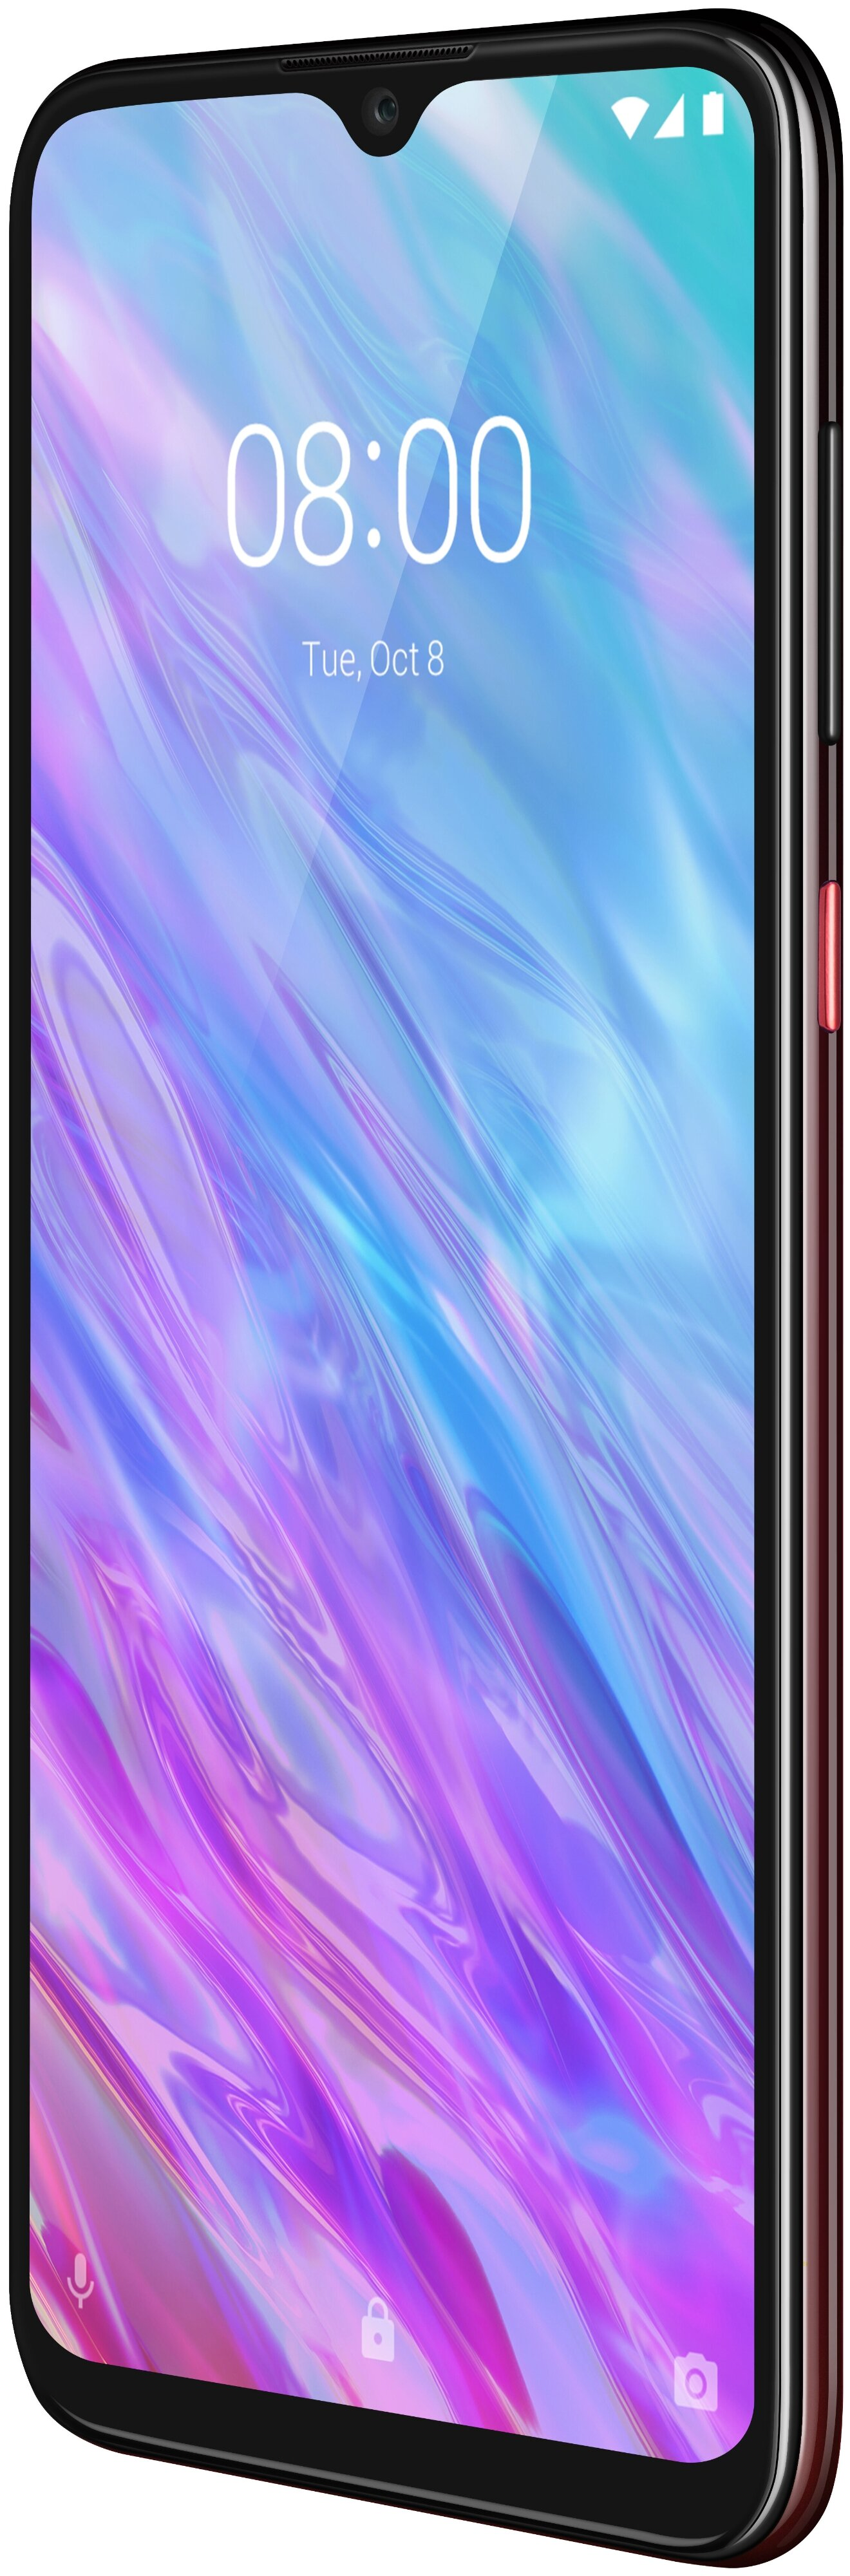 ZTE Blade 20 Smart - операционная система: Android 9.0